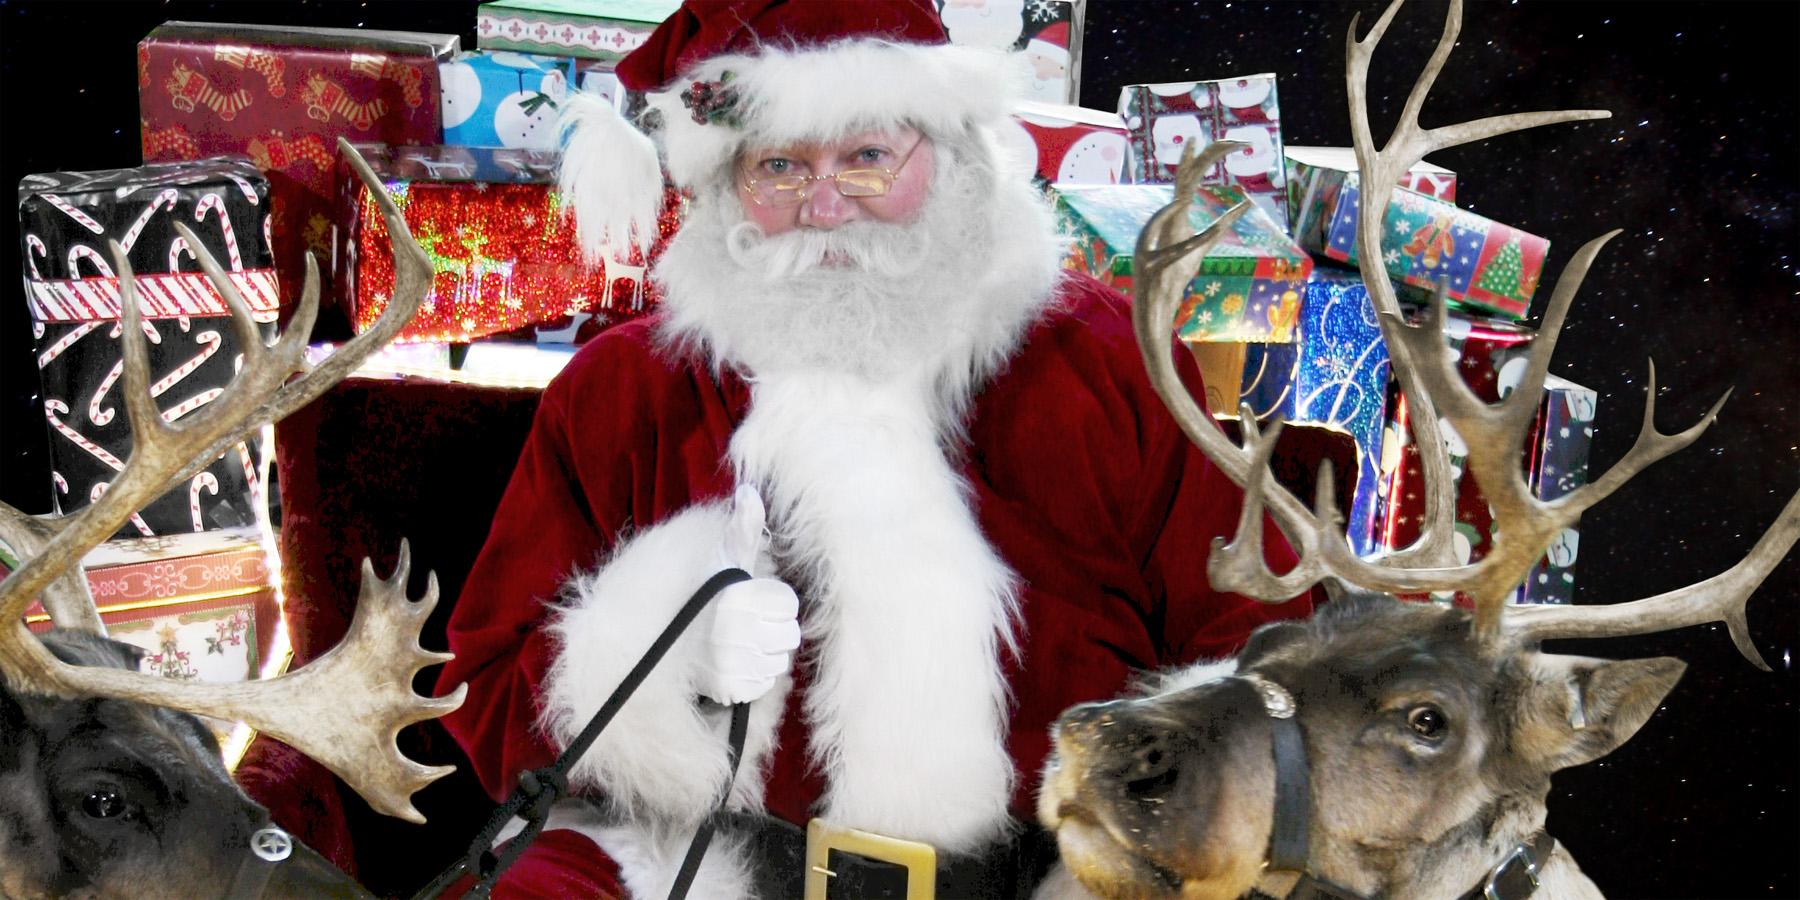 Kids Use Santa Snooper Sleigh-cam To Spy On Christmas Eve ...